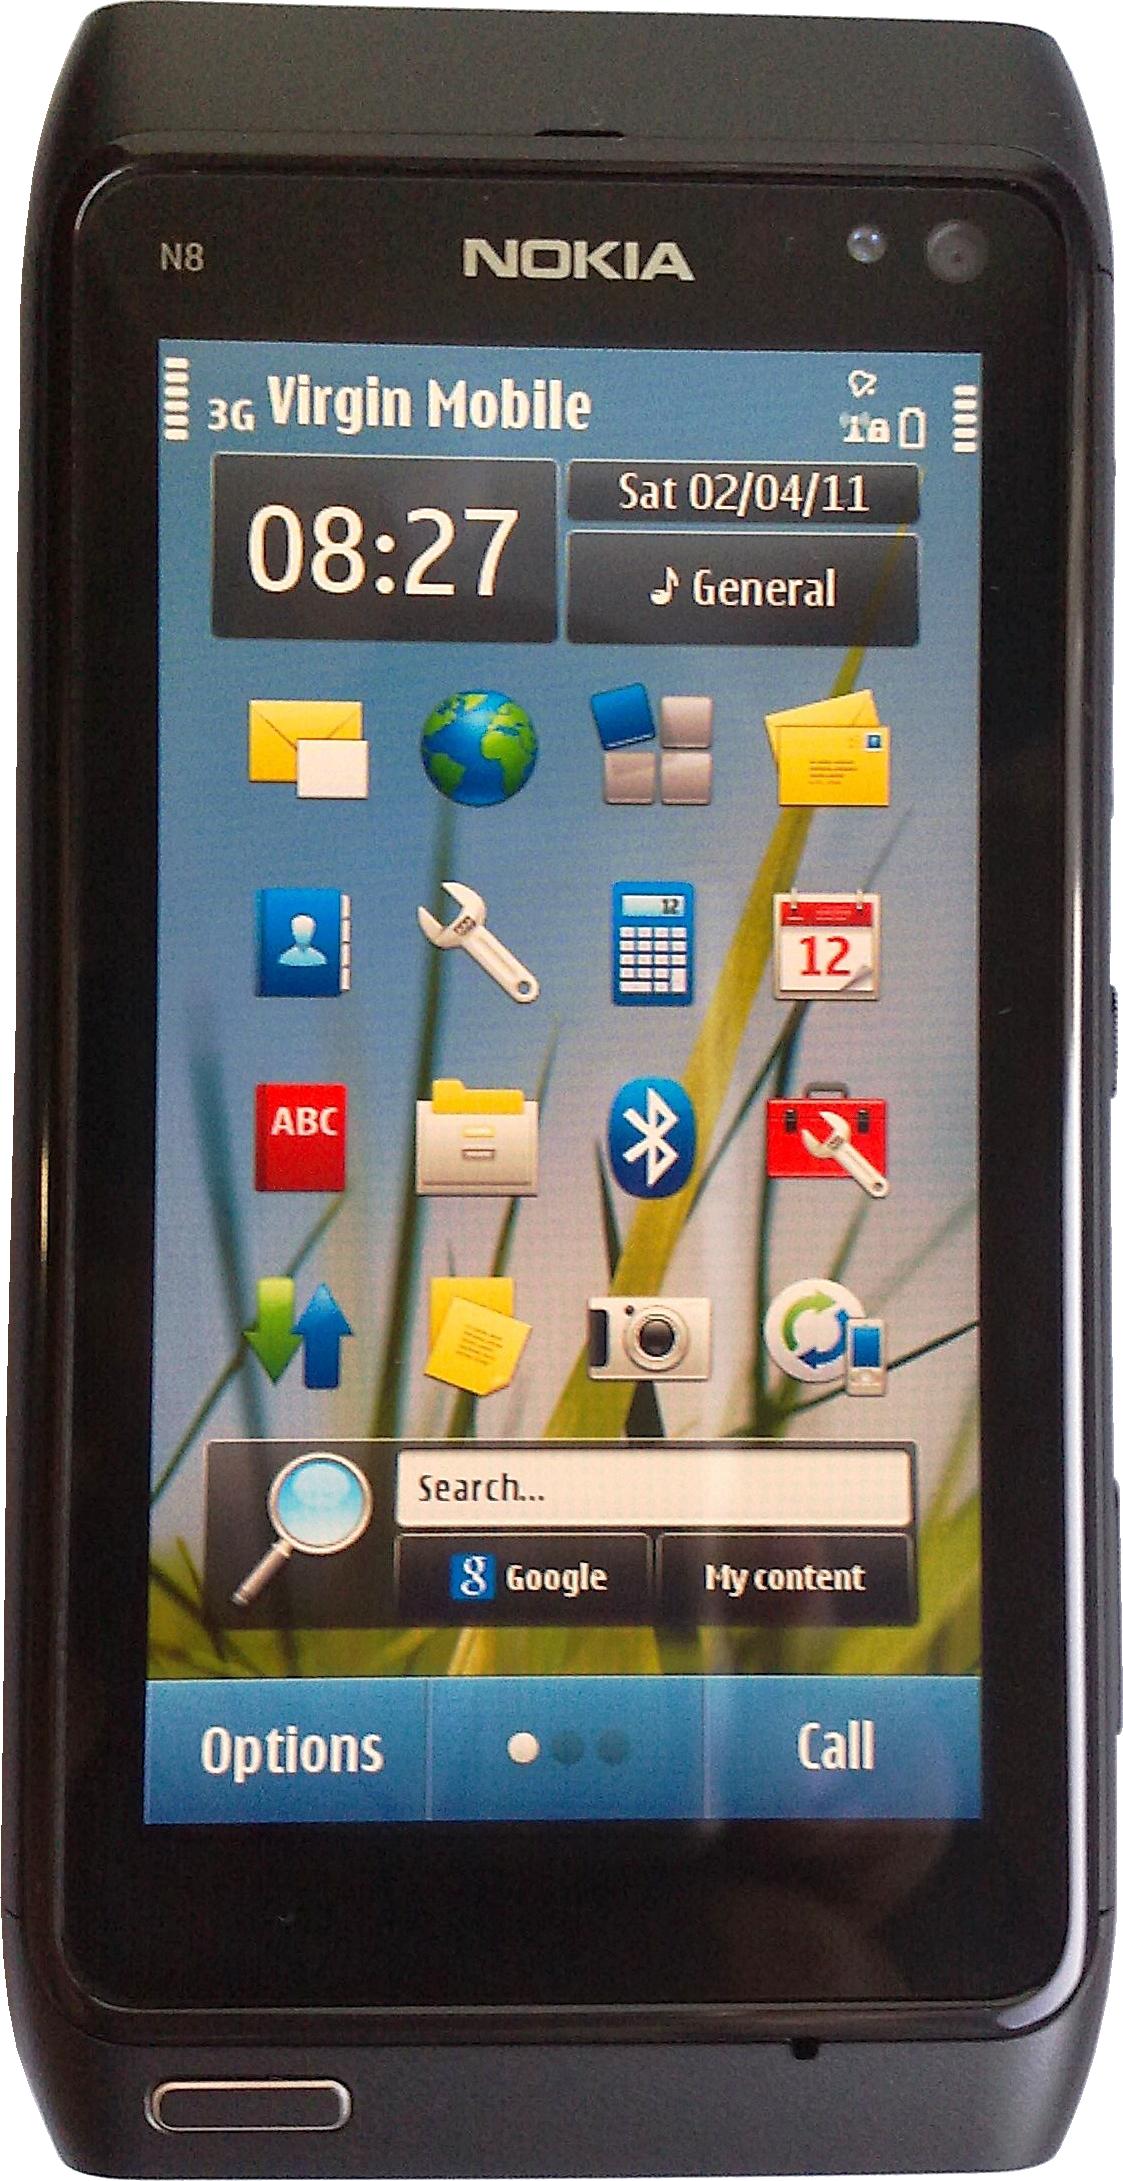 Nokia N8 Wikipedia